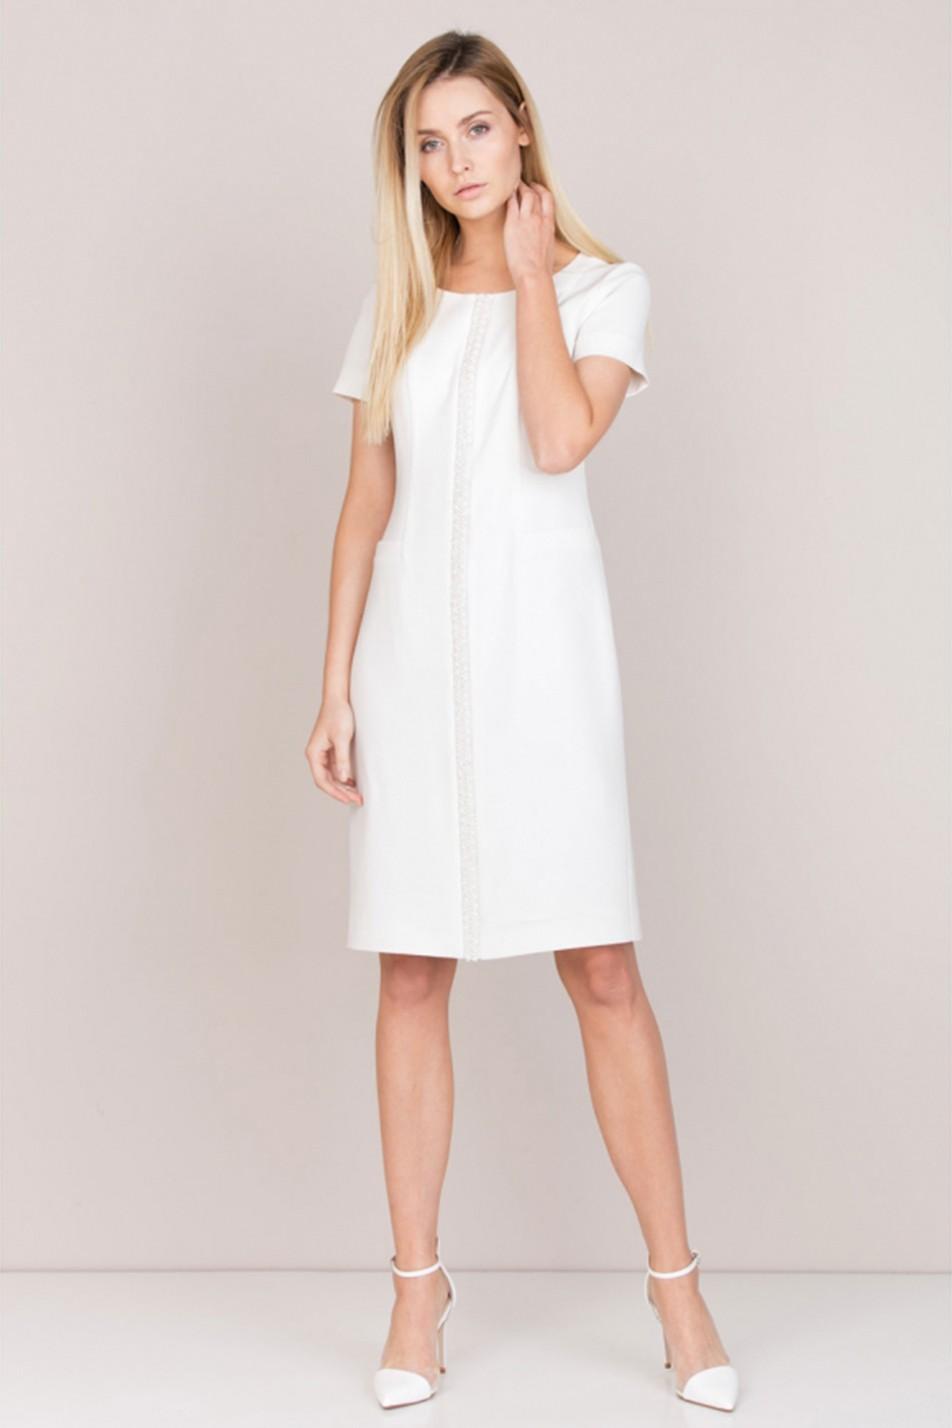 Biała elegancka sukienka do kolan